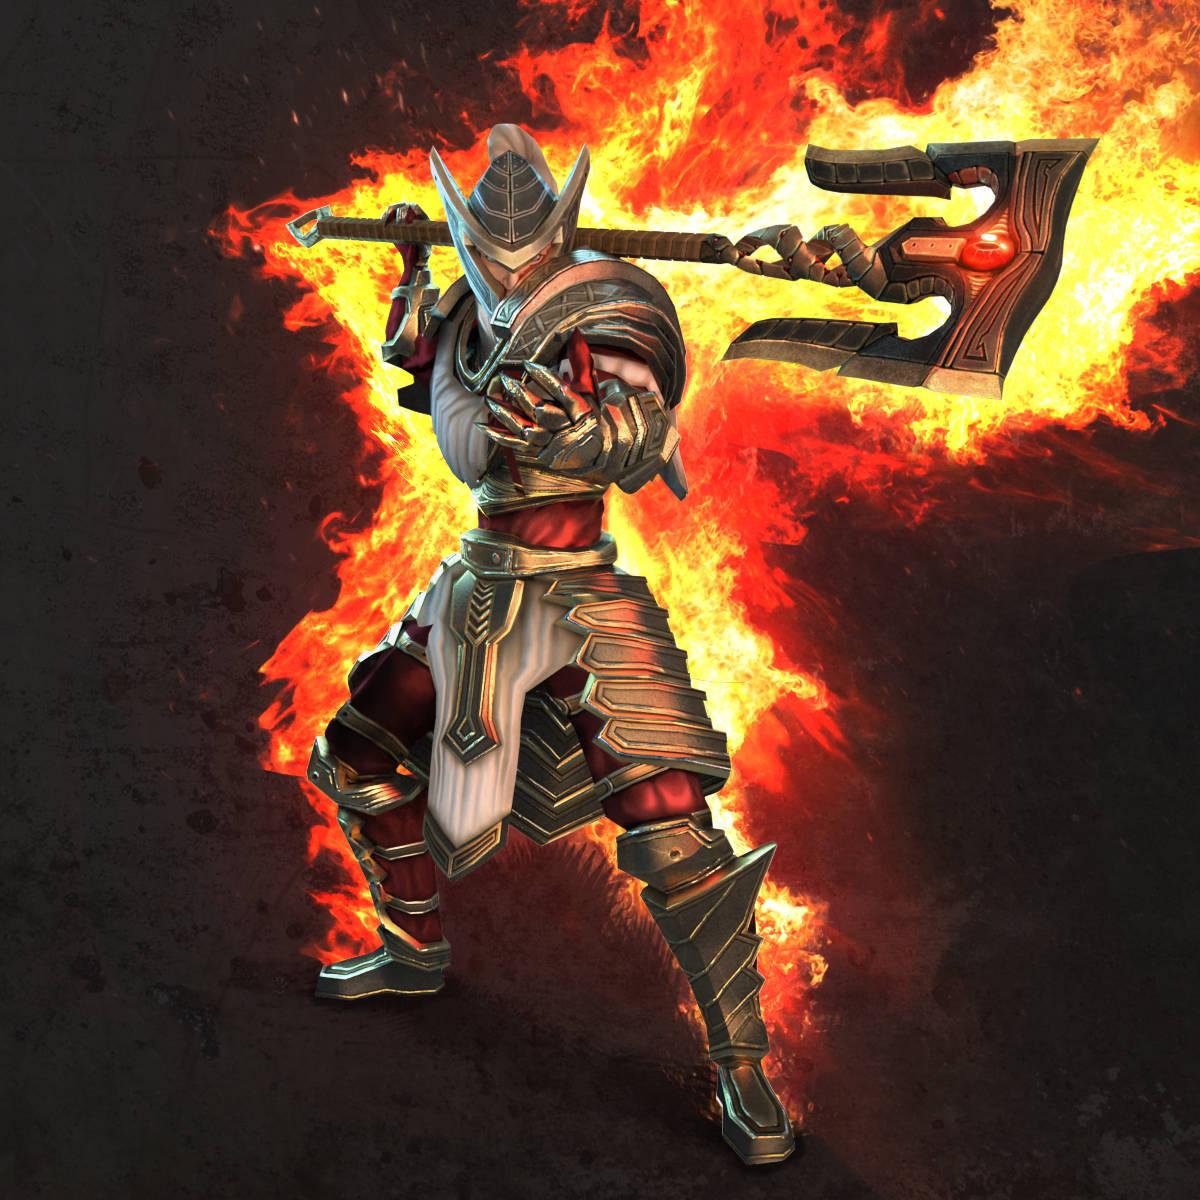 kyn_action_rpg_pre-order_body_armour_bonus